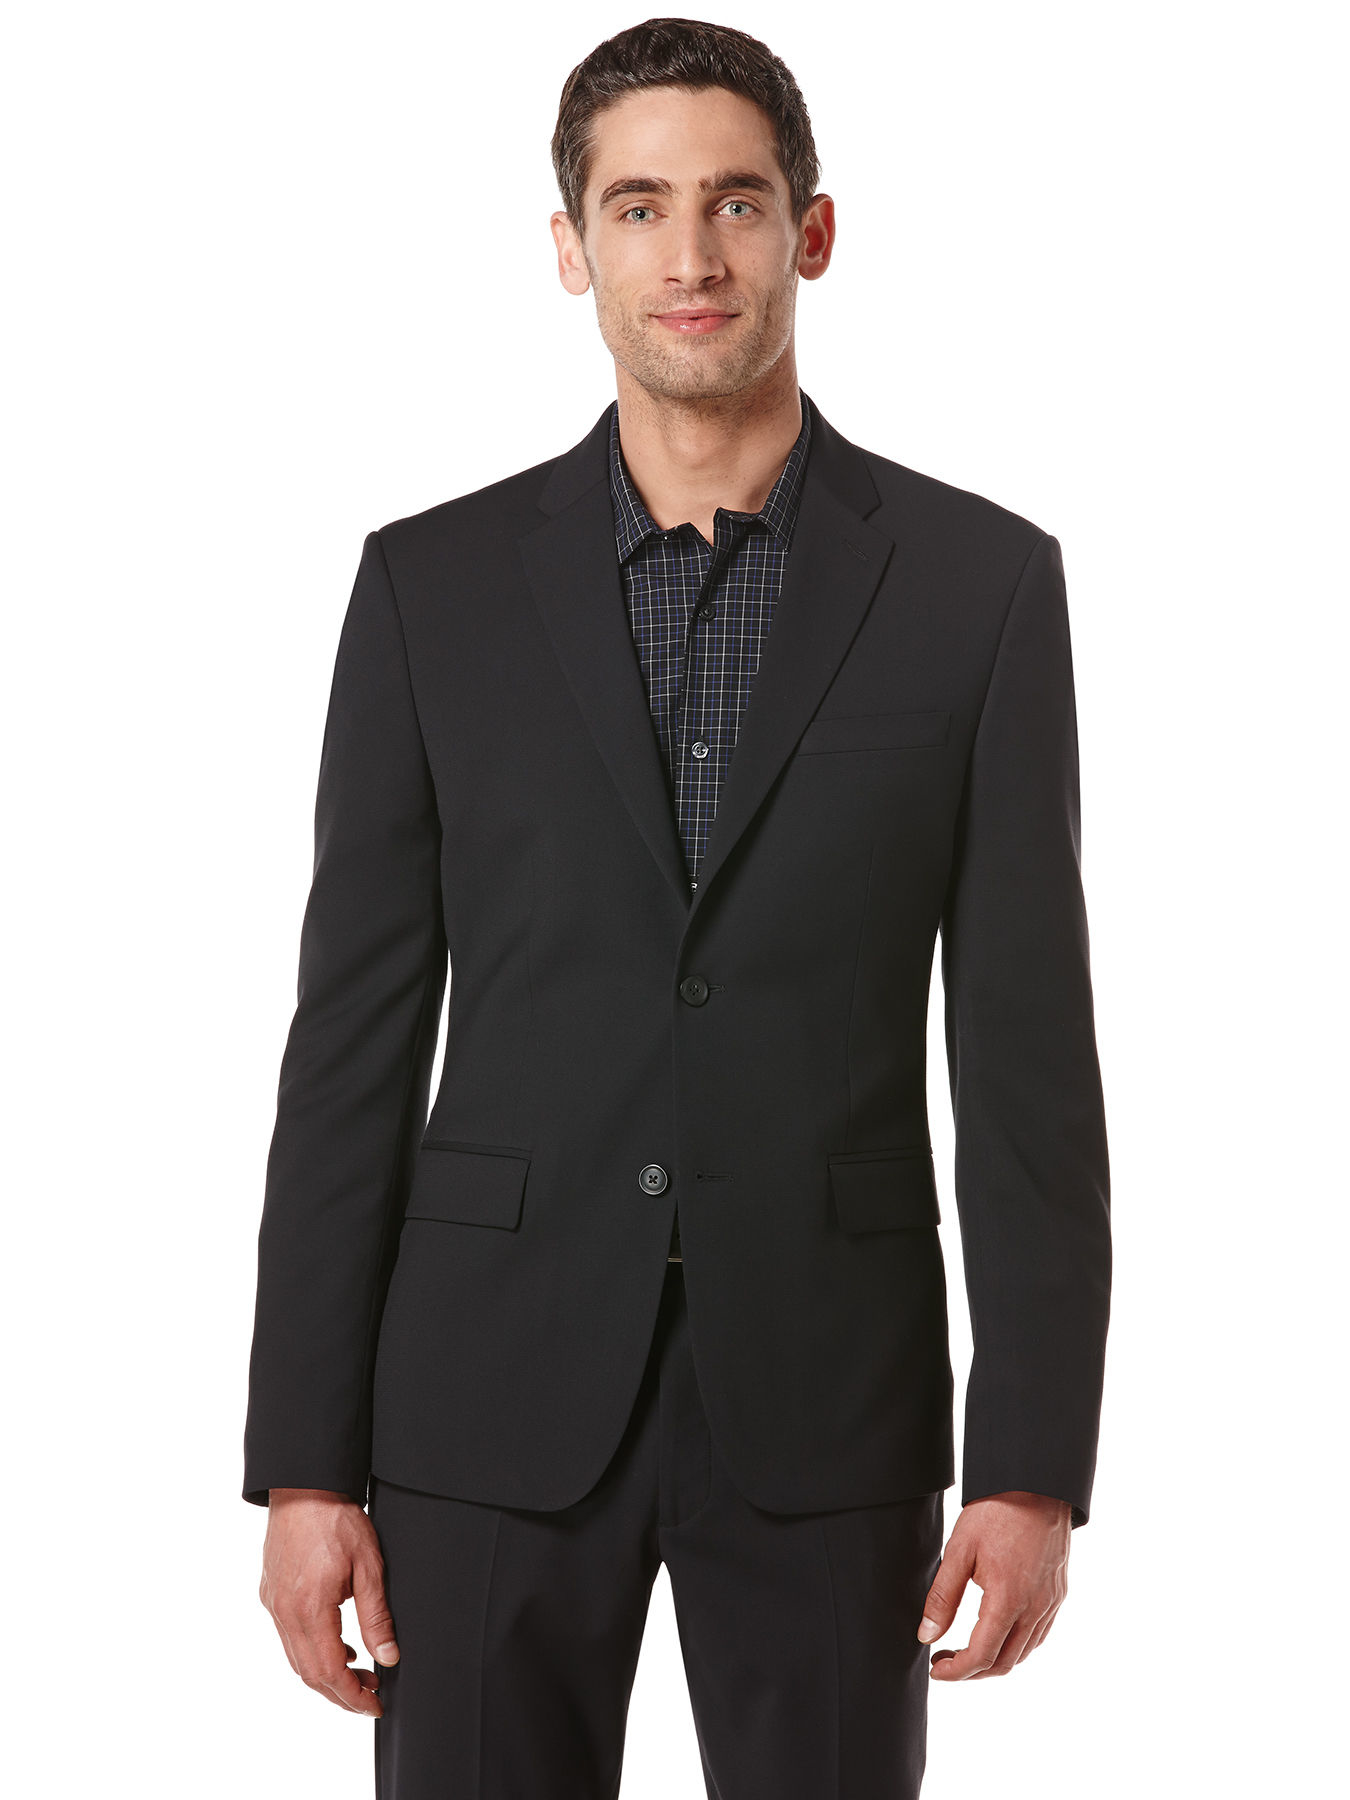 Perry Ellis Slim Fit Textured Washable Suit Jacket